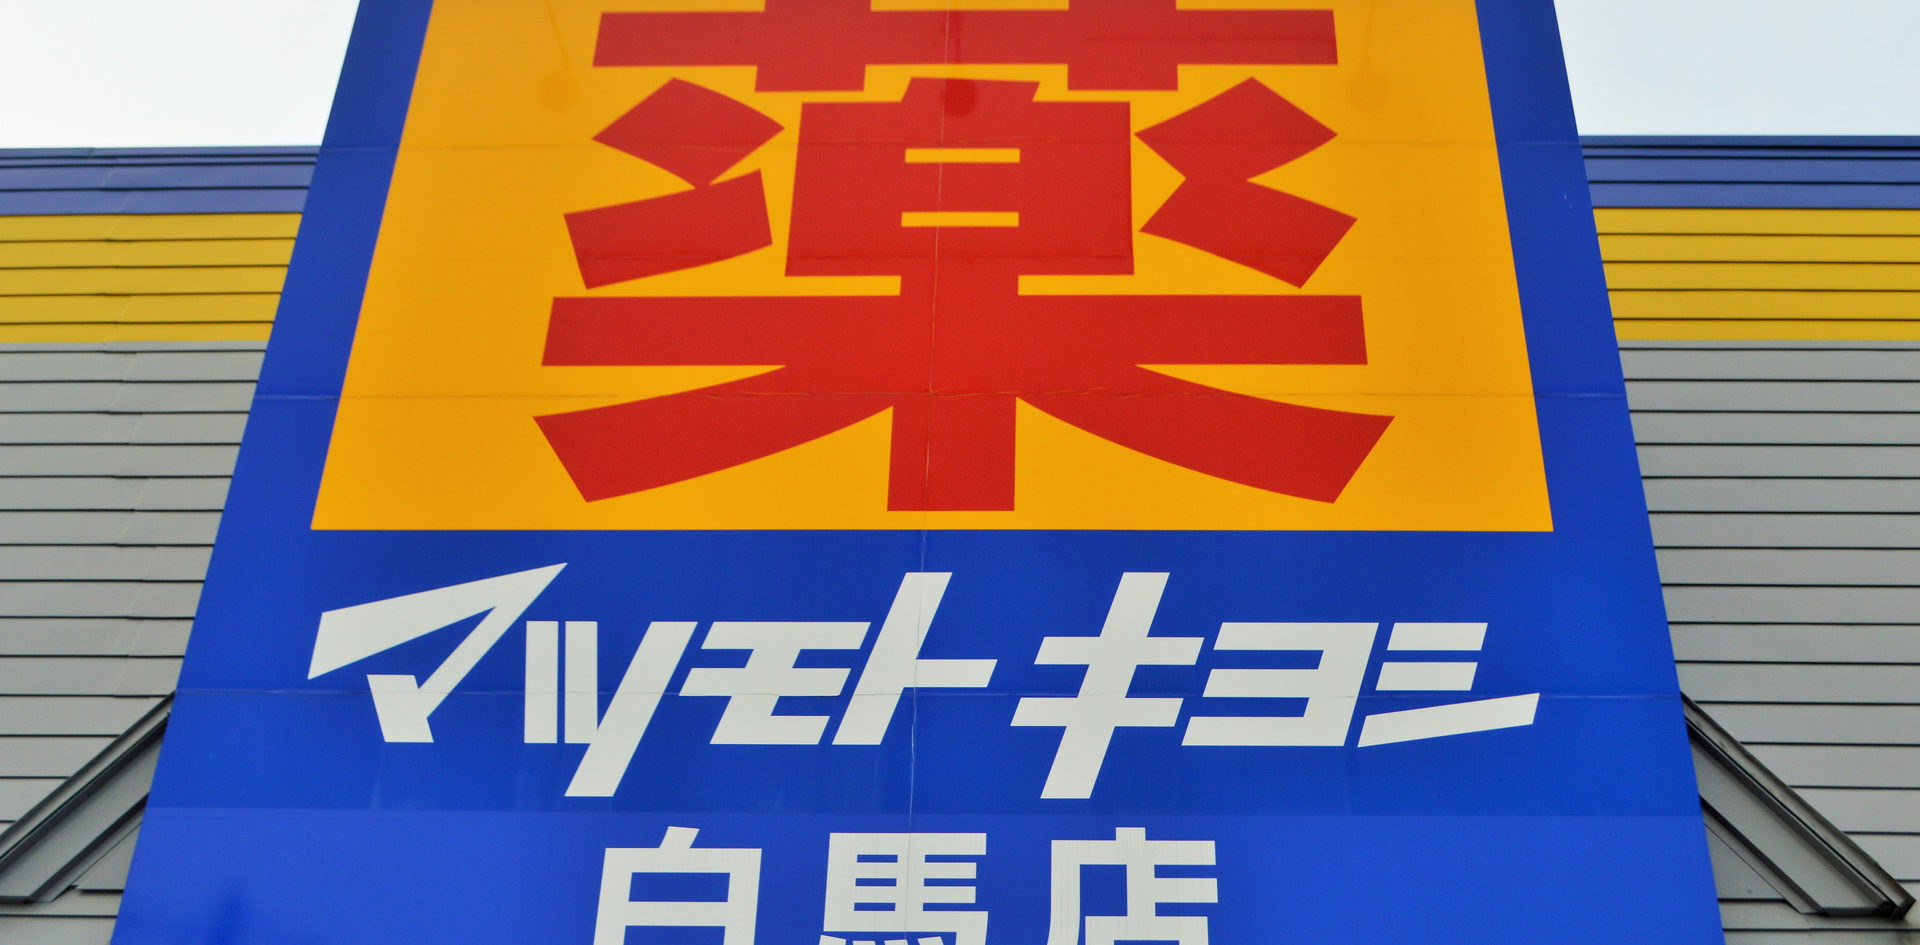 matsukiyo_1.JPG